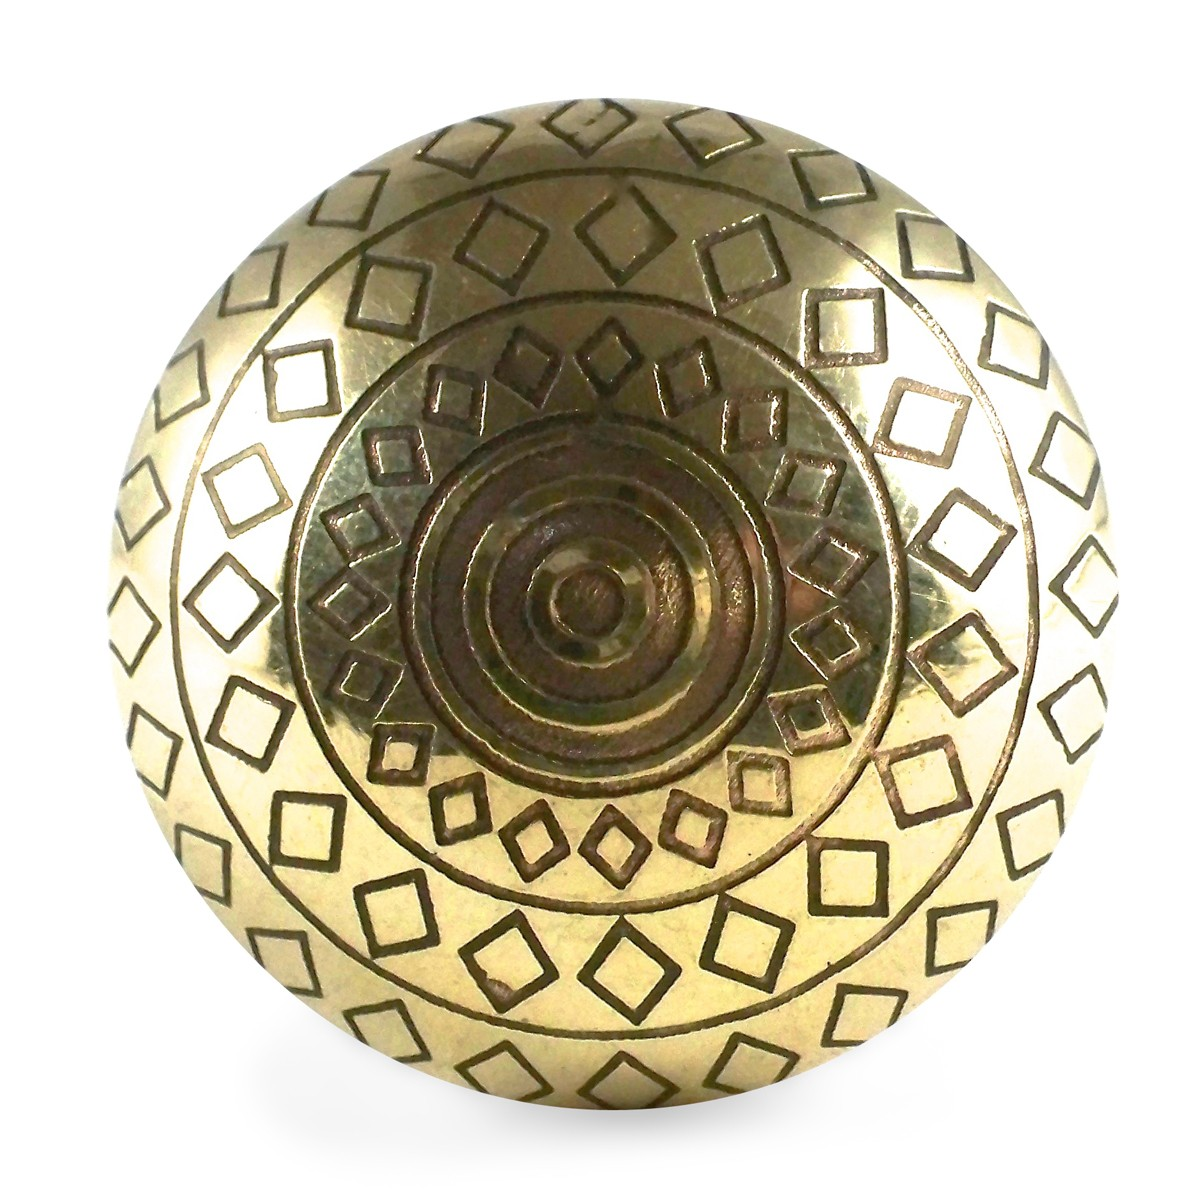 bouton de meuble metal dor diamants vintage 4 50 me14. Black Bedroom Furniture Sets. Home Design Ideas